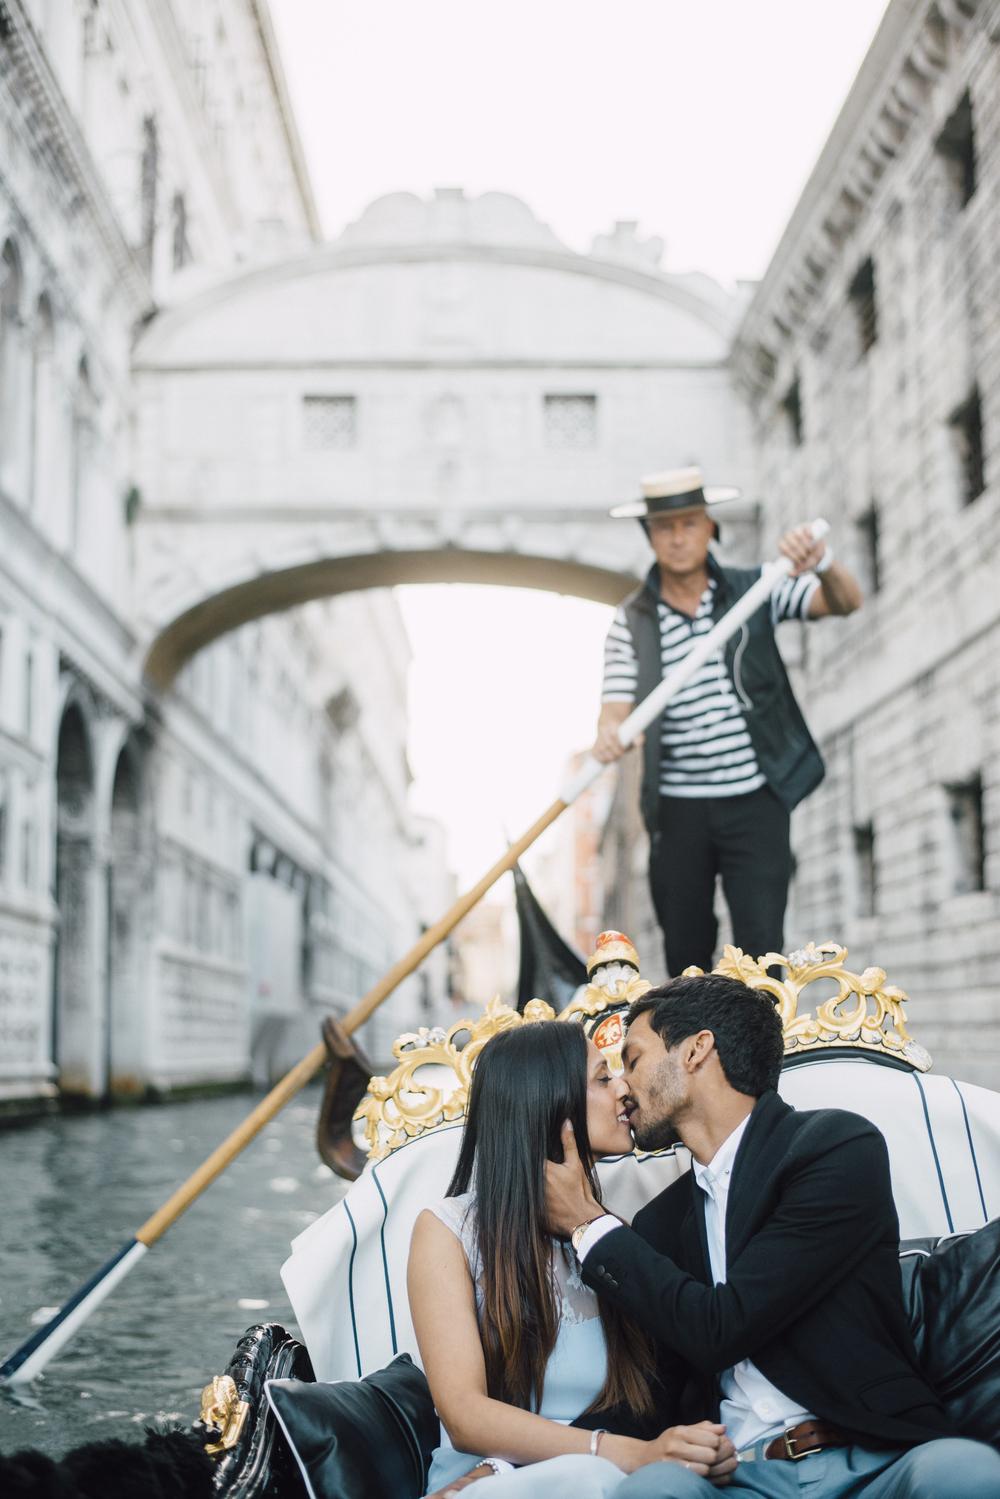 Beautiful gondola proposal in Venice